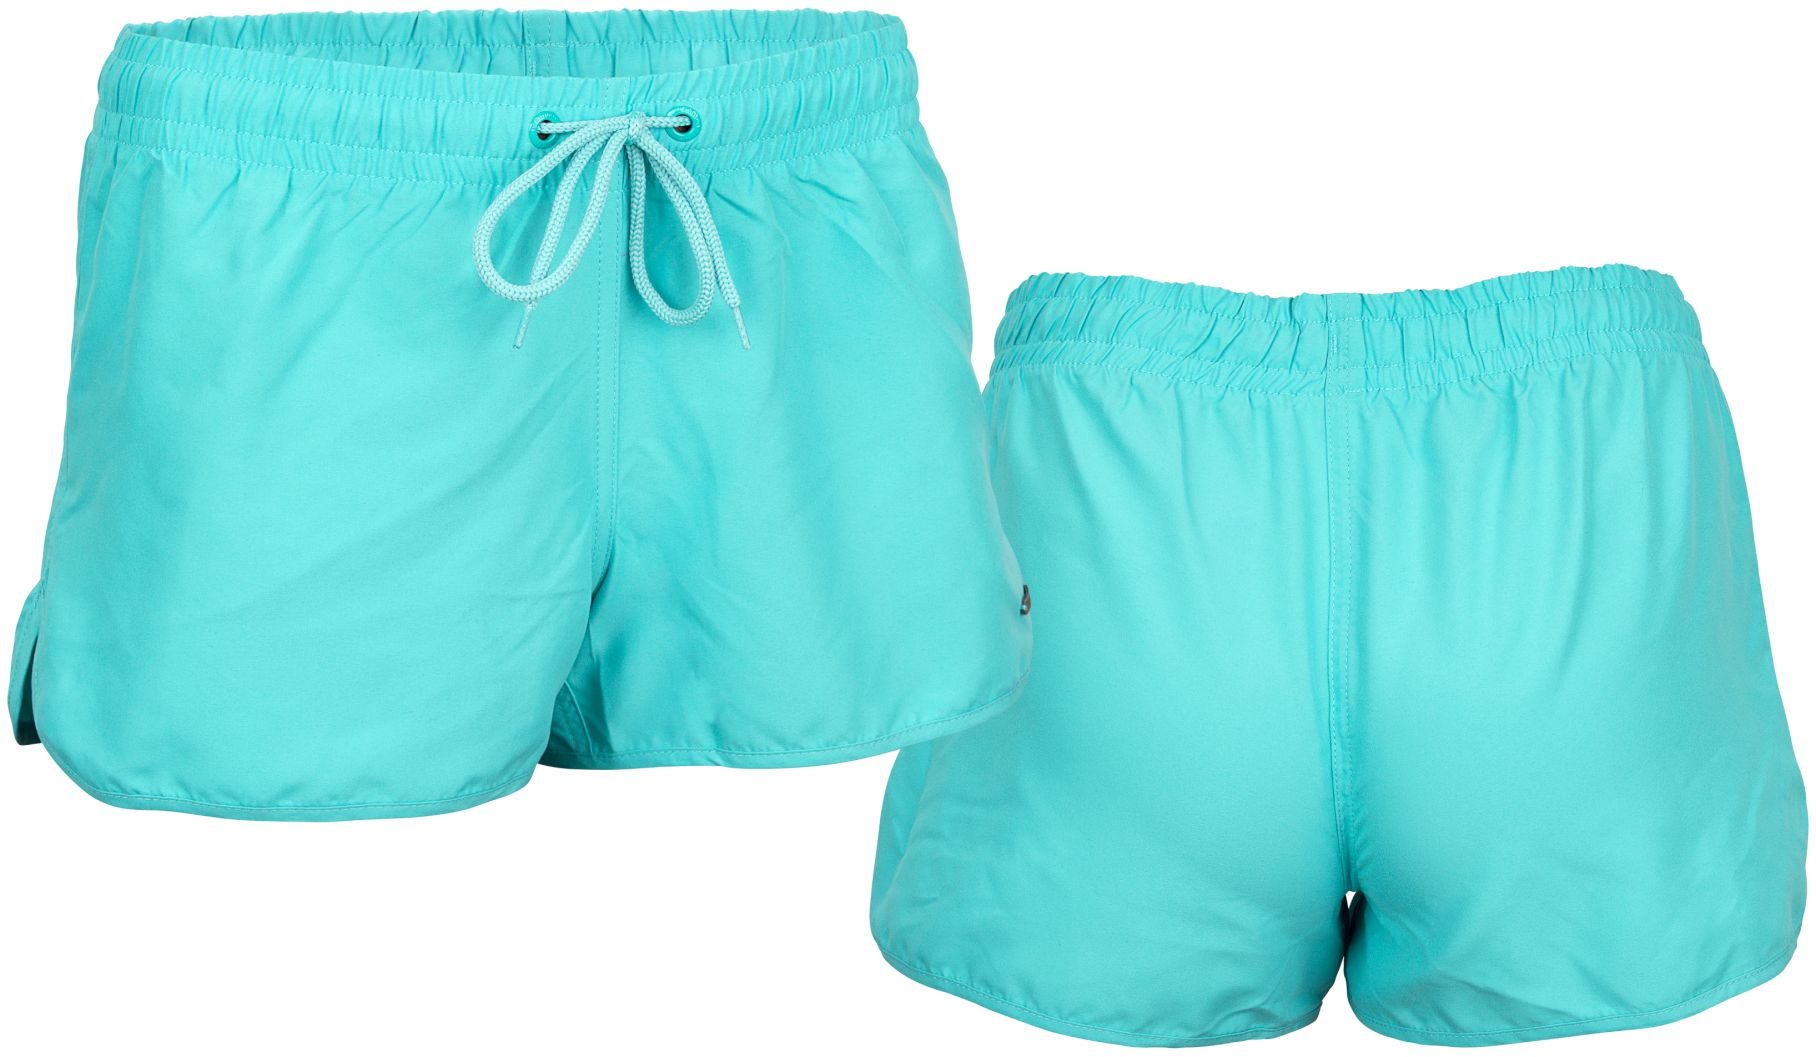 Beach Short Meisjes • Coco •